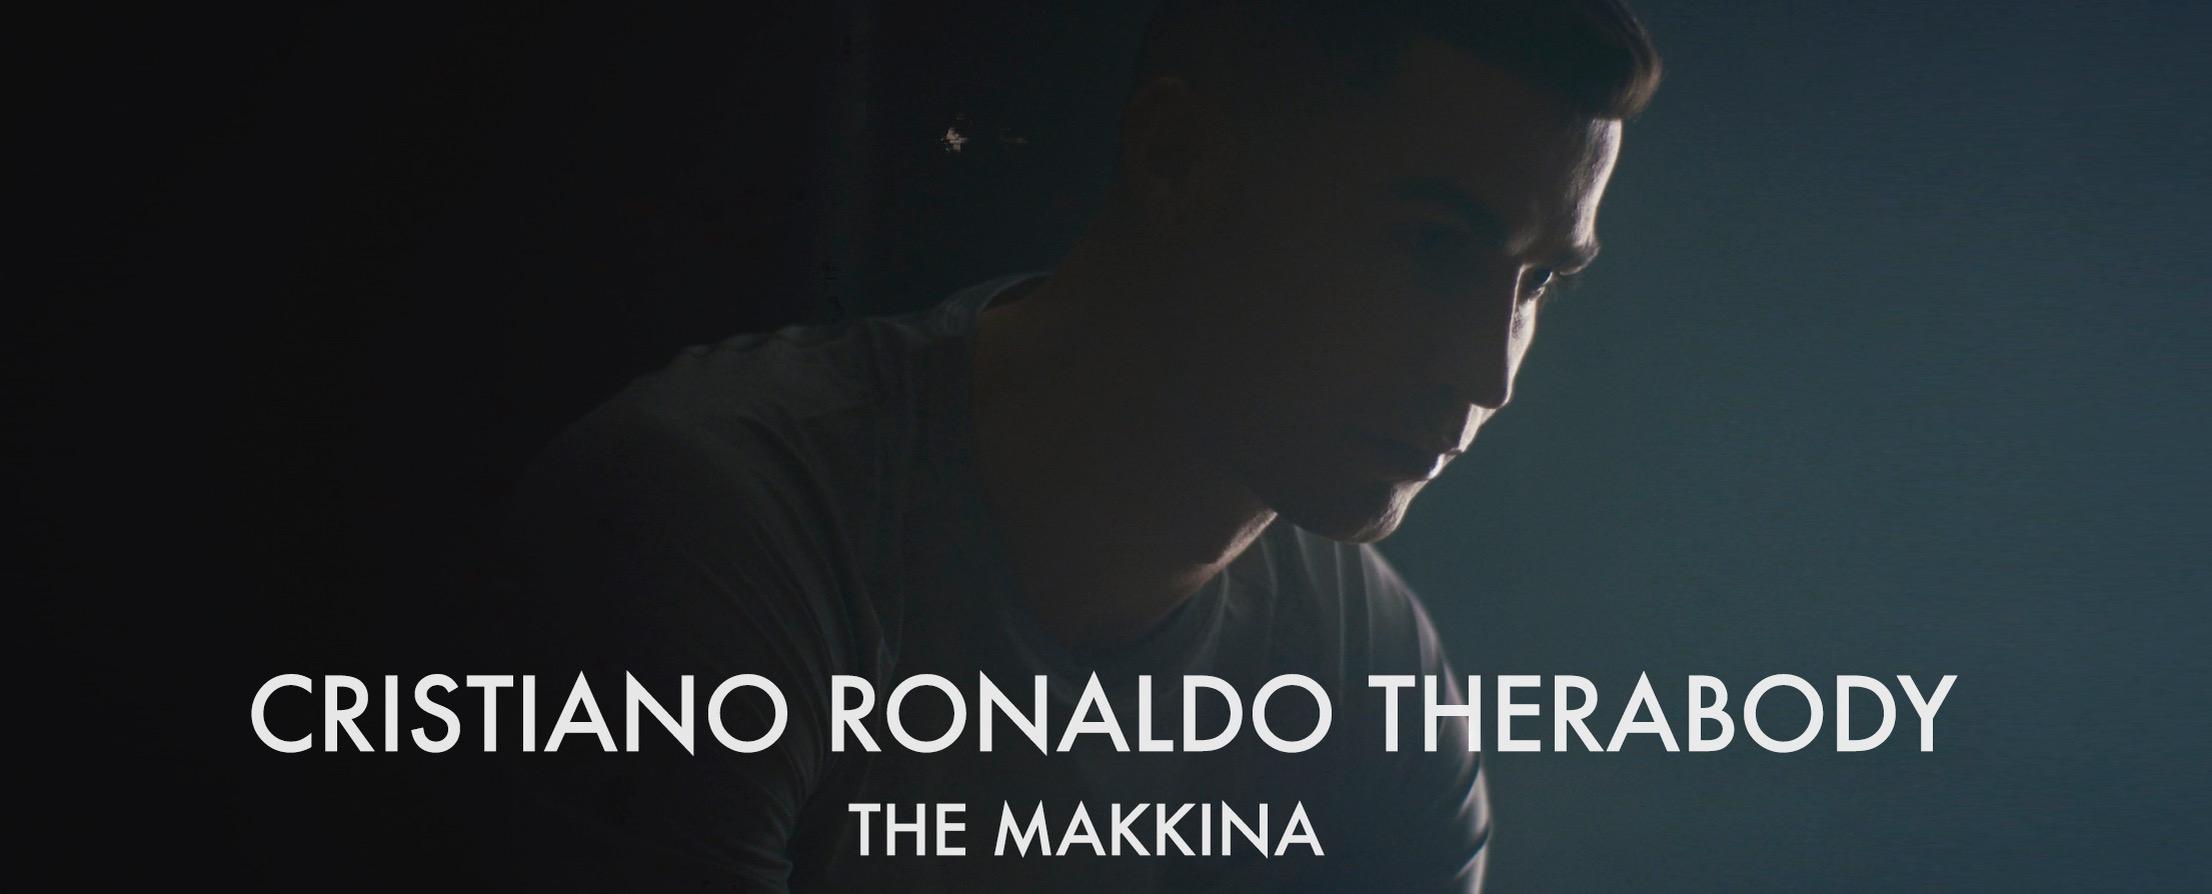 Therabody with Cristiano Ronaldo